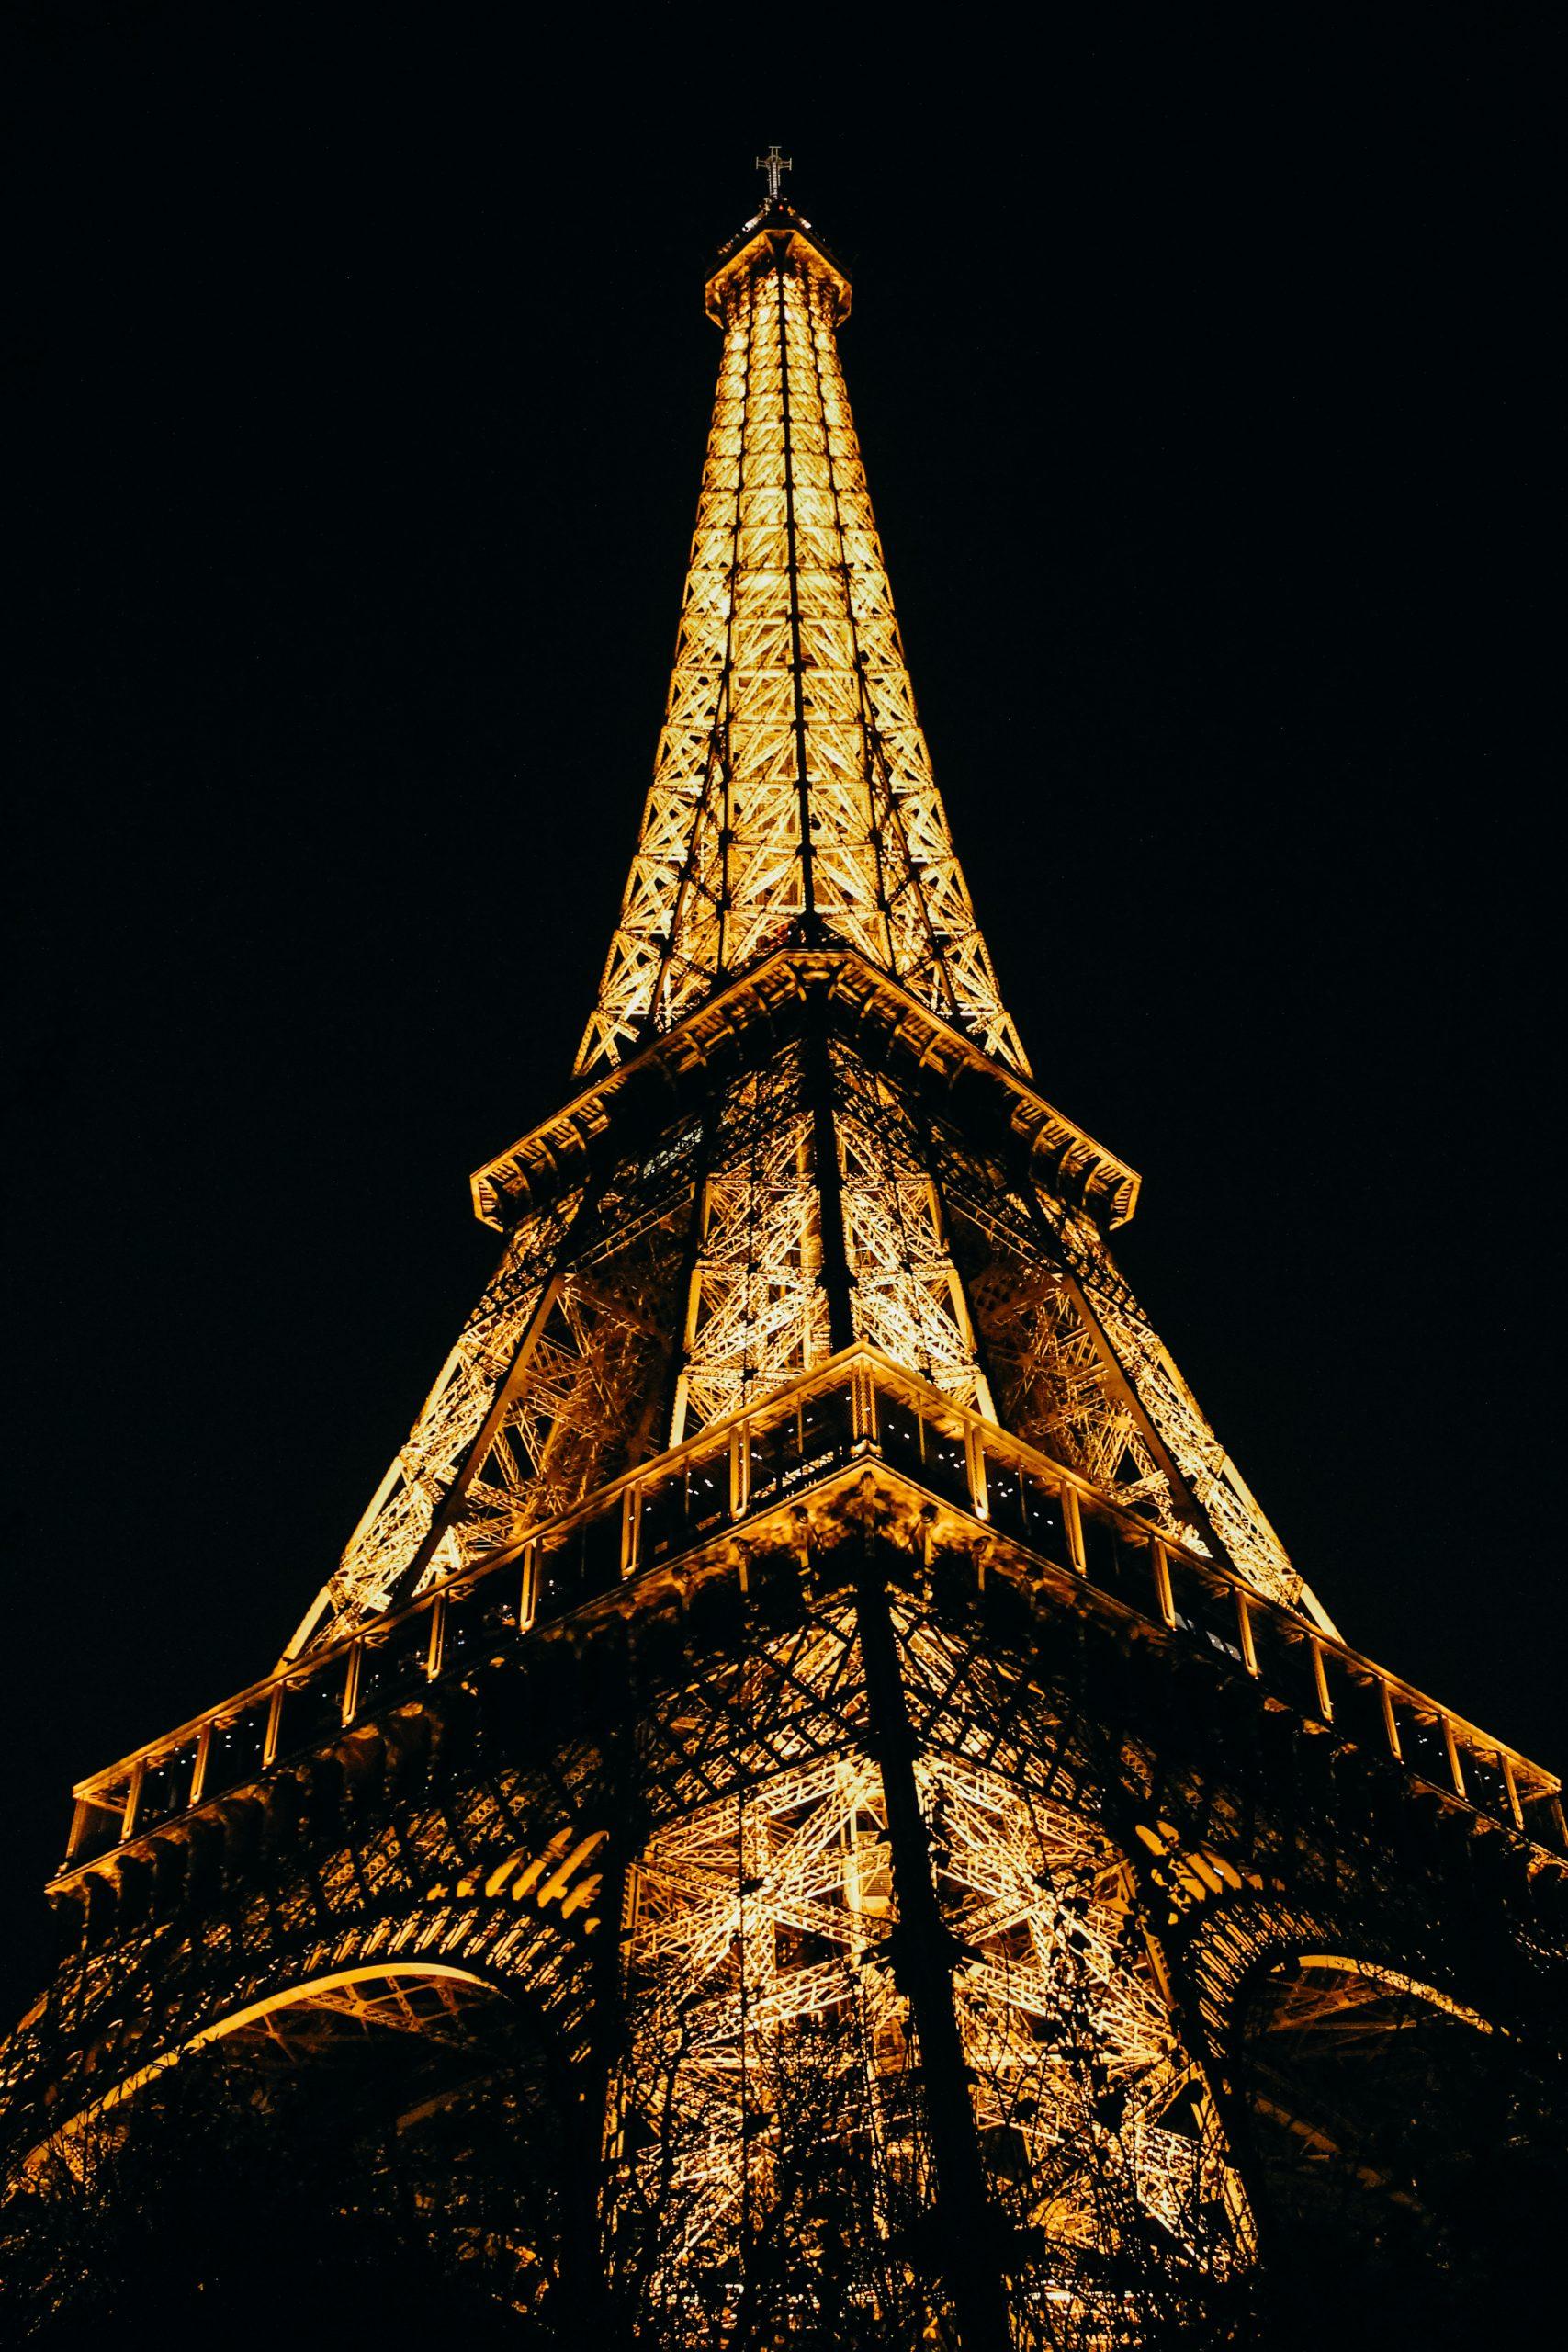 night Eiffel Tower Paris France